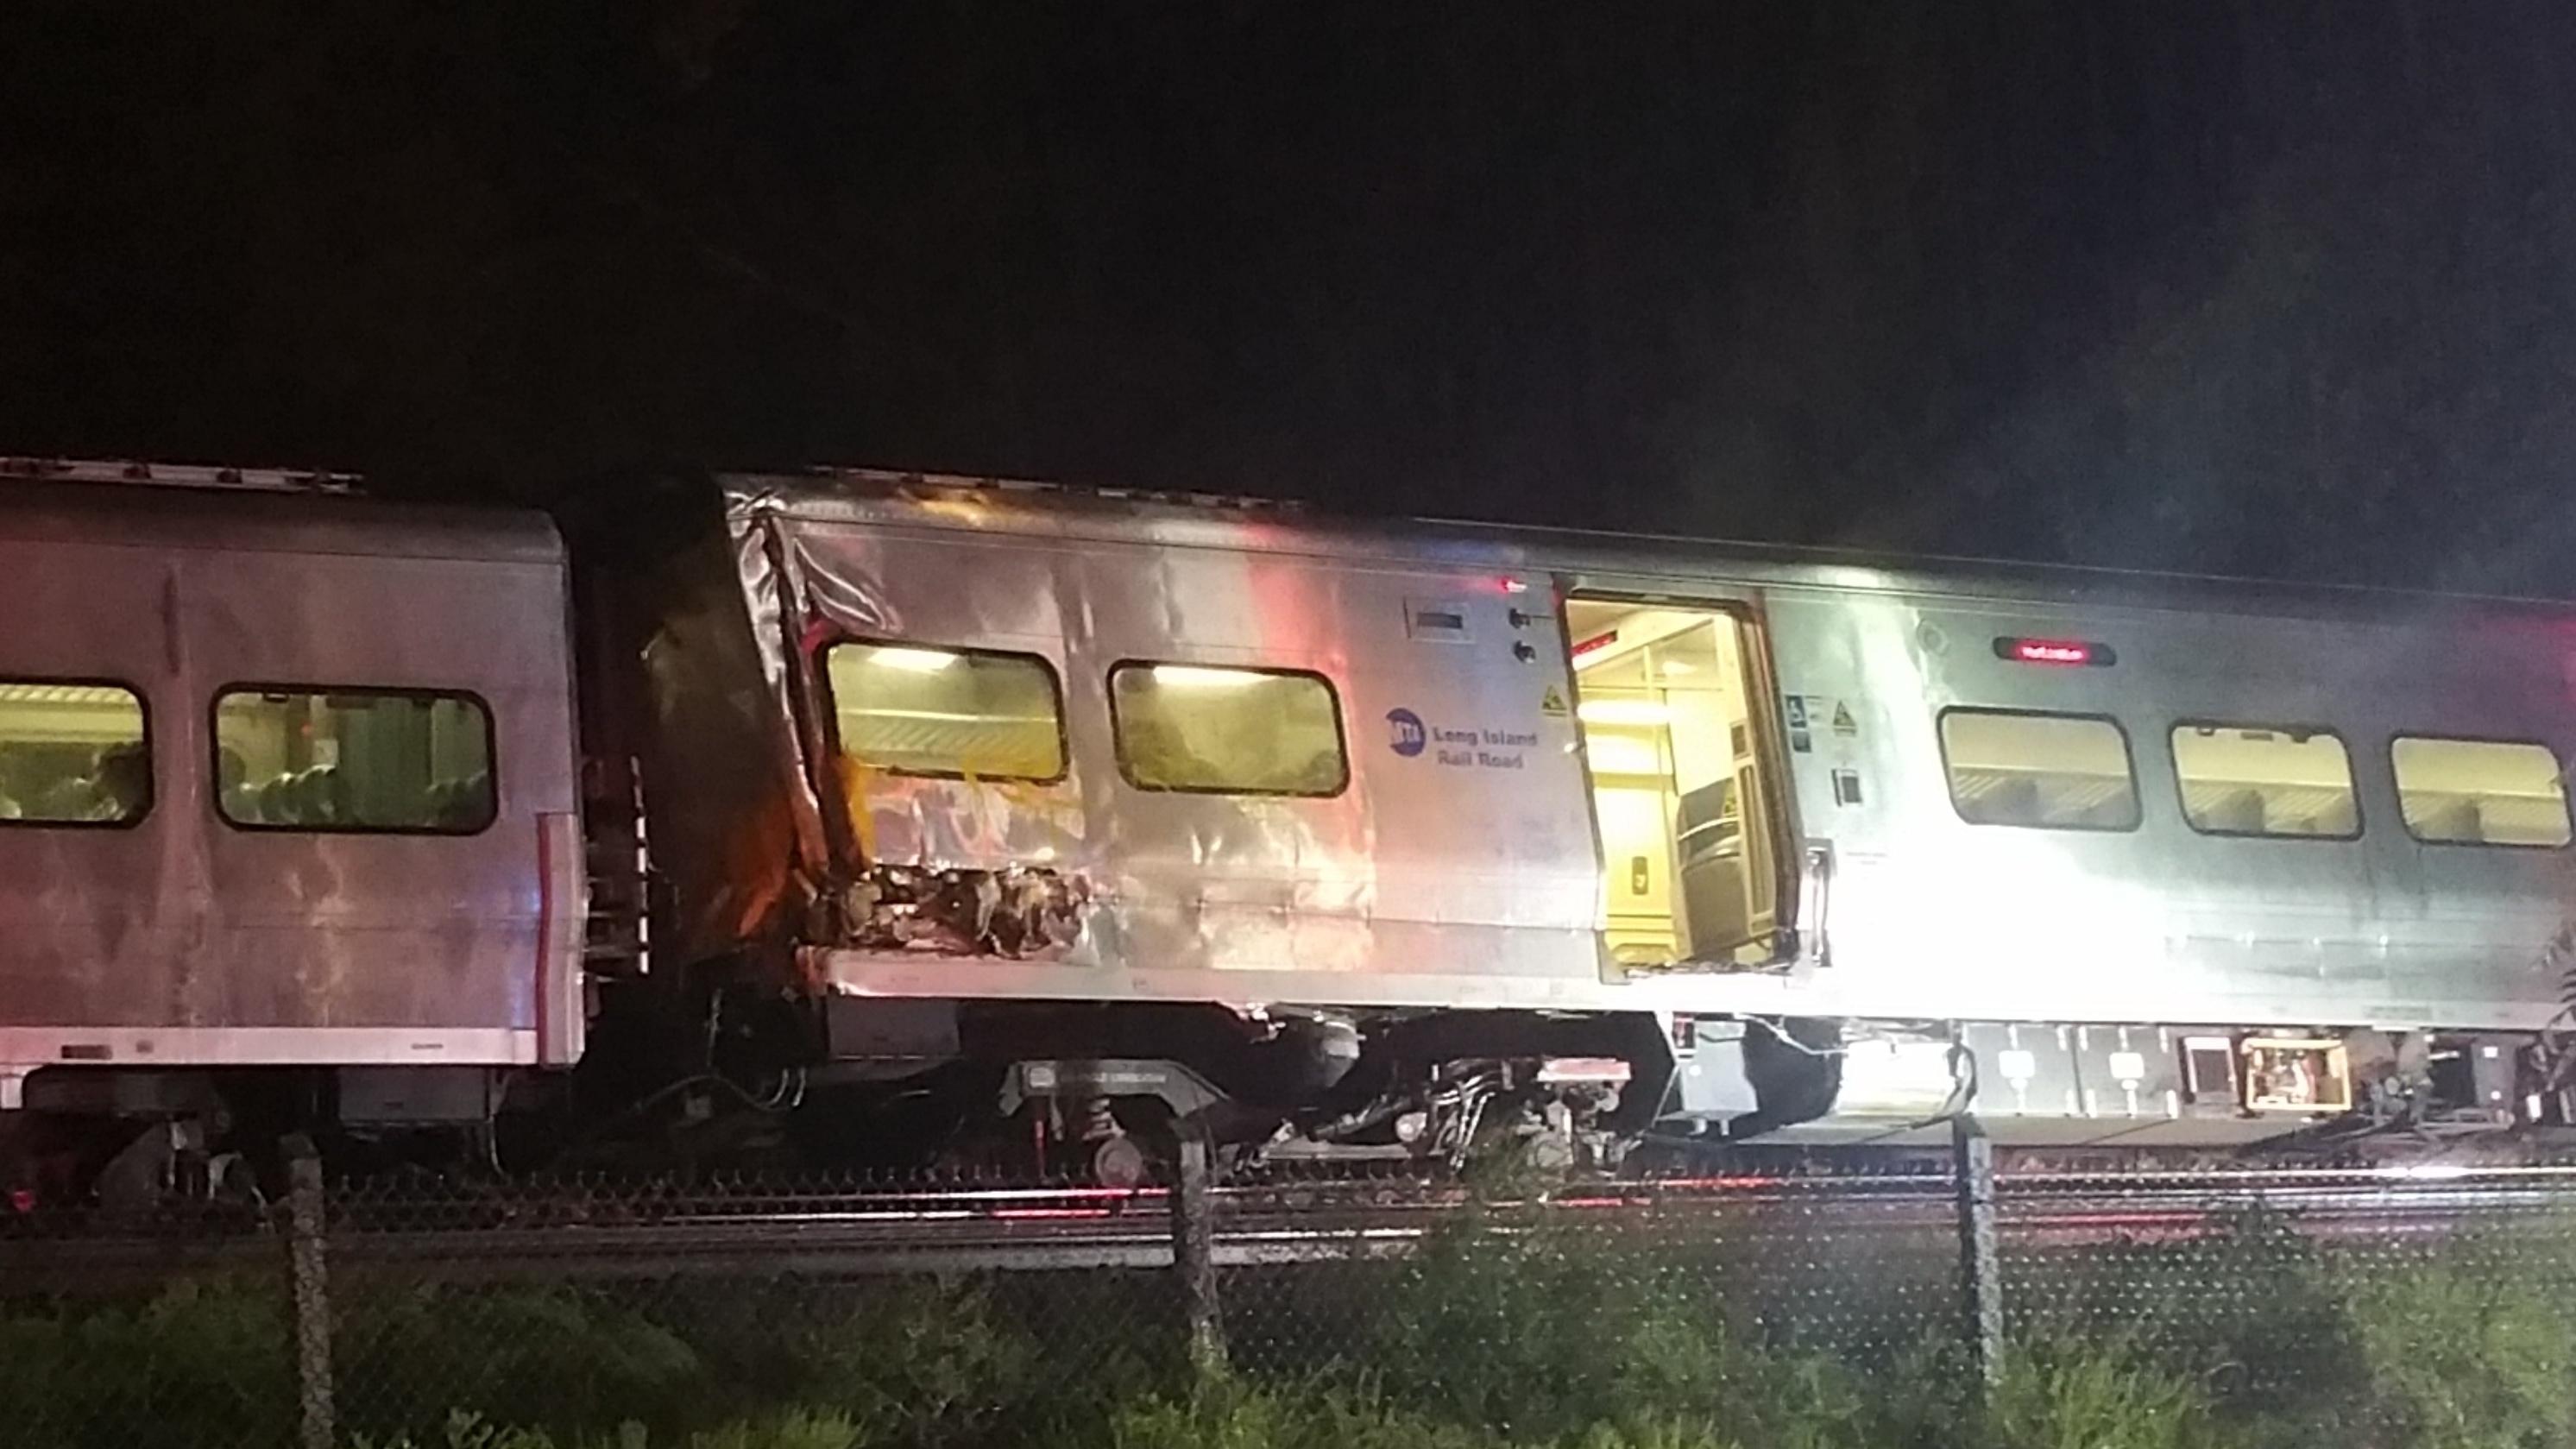 Governor: Full service back after weekend train derailment